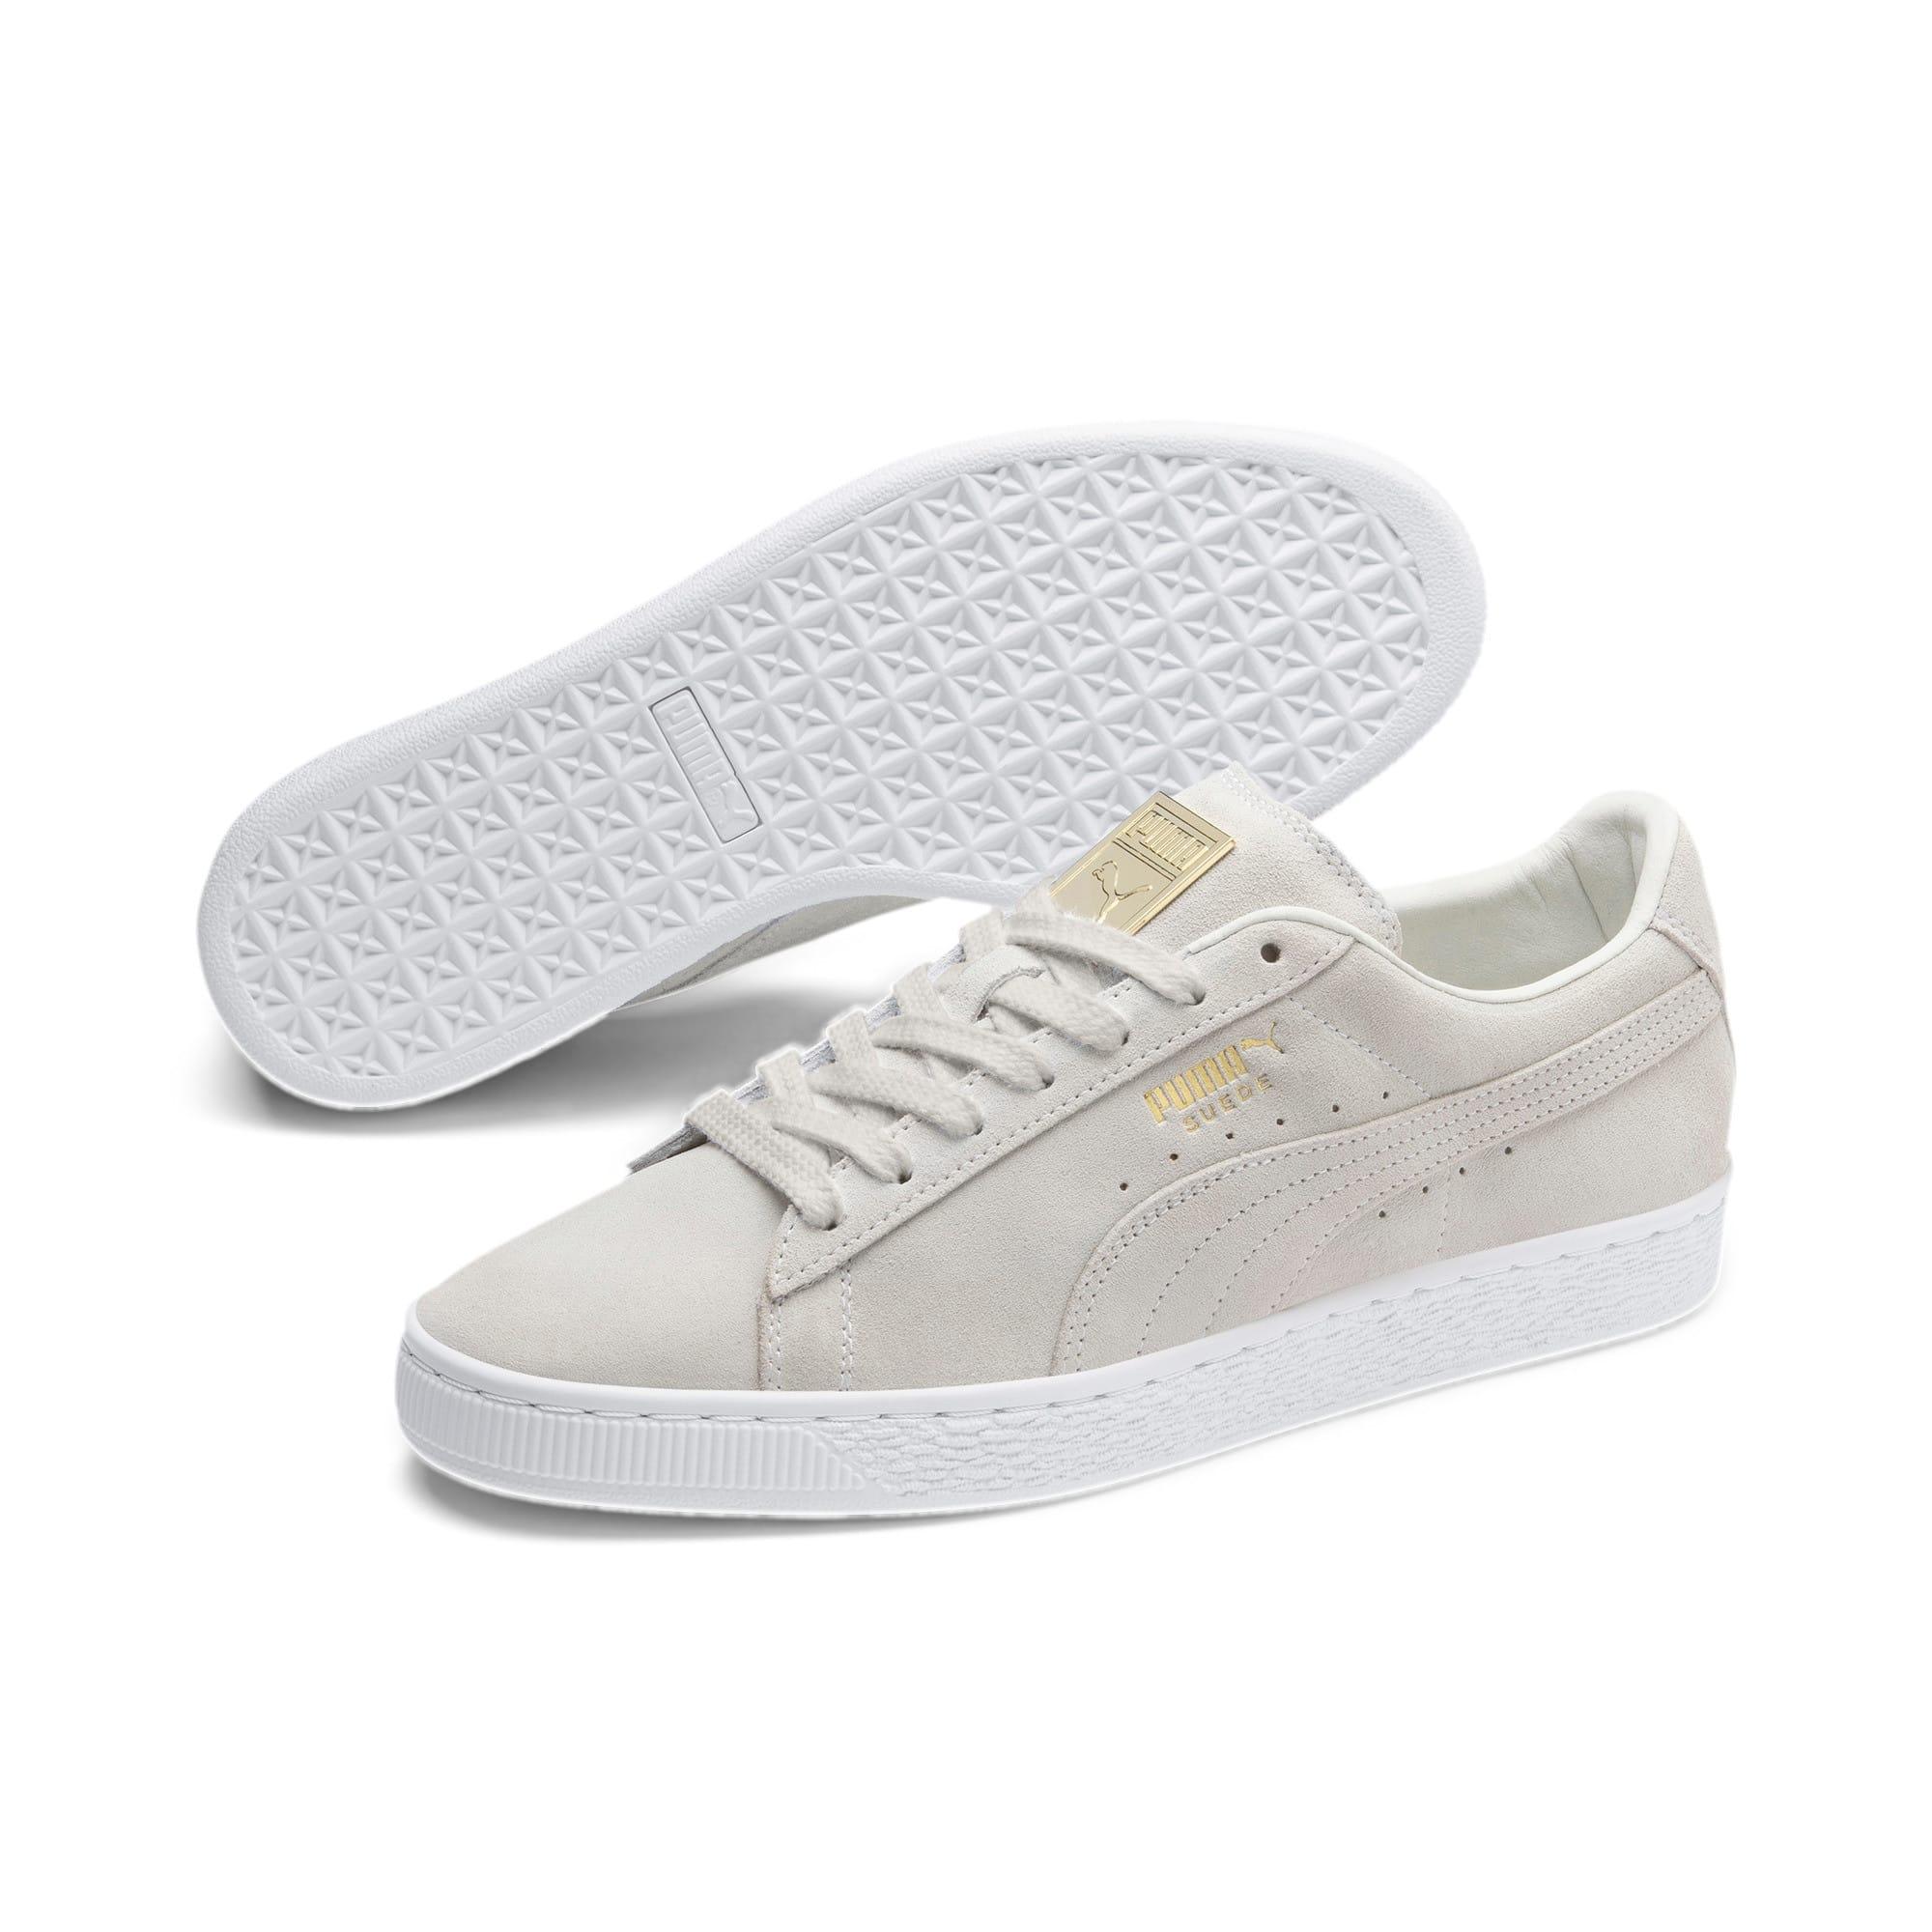 Thumbnail 3 of Suede Classic Metal Badge Sneakers, Puma White-White-Team Gold, medium